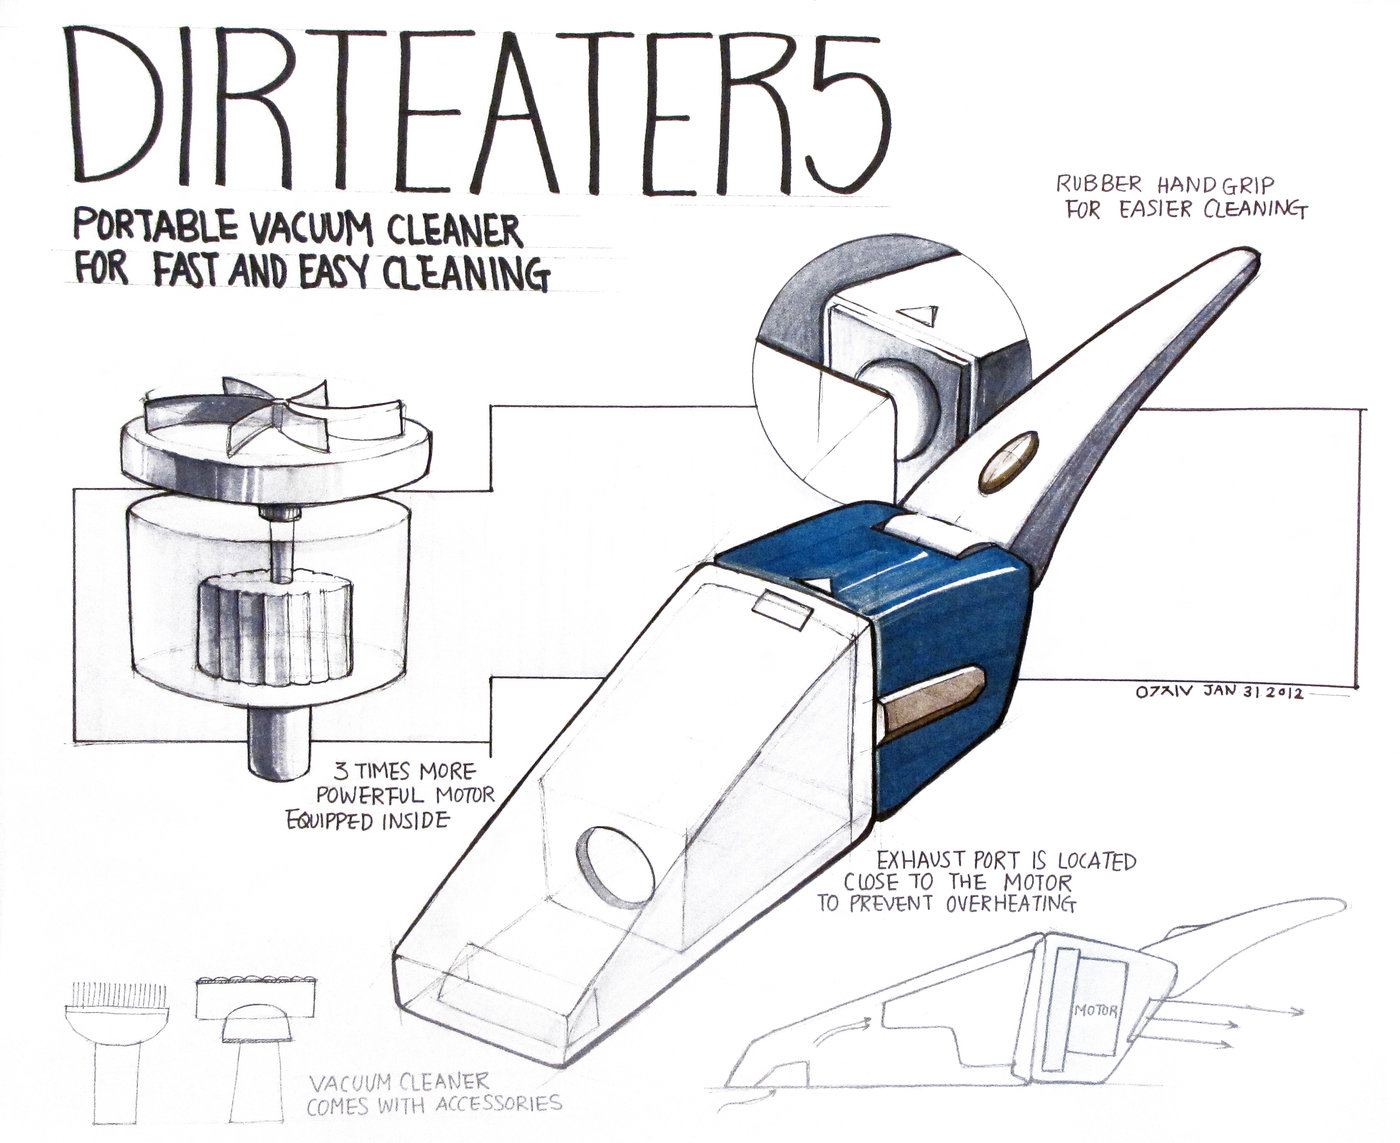 Vacuum Cleaner Drawings by Woojin Joy Chung at Coroflot com